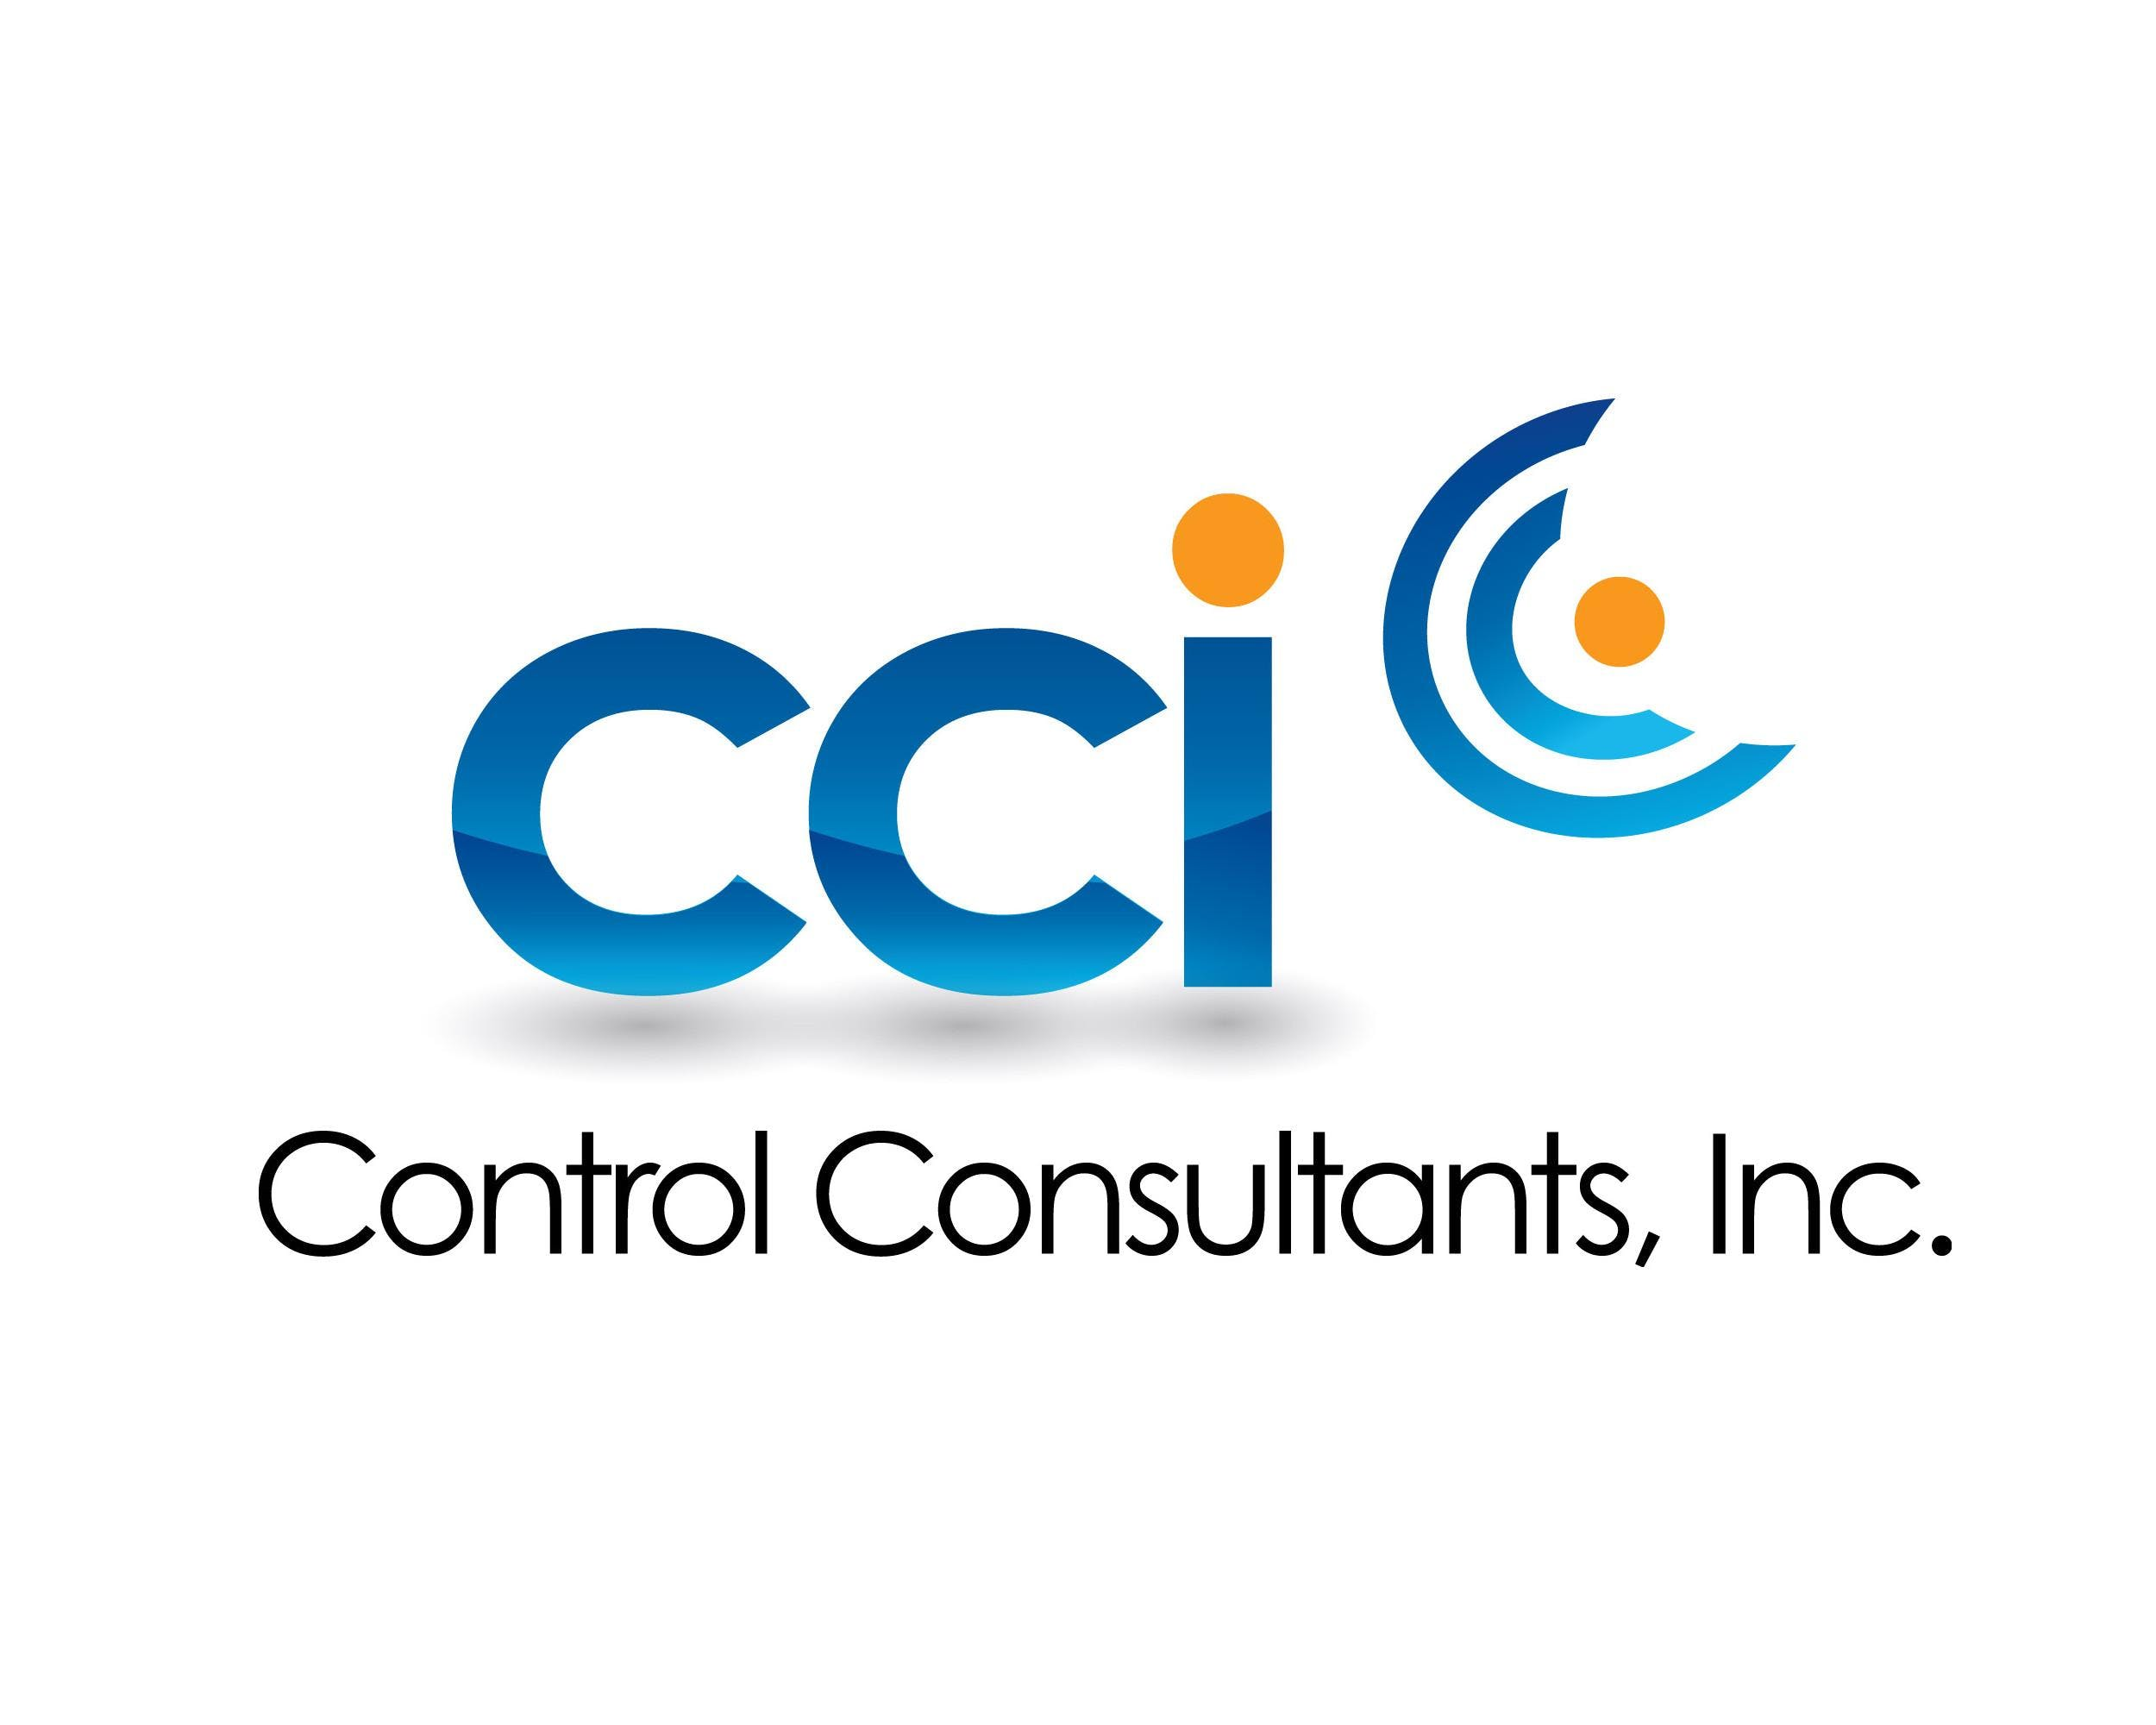 Niagara 4 Certification June 2018 At Control Consultants Inc